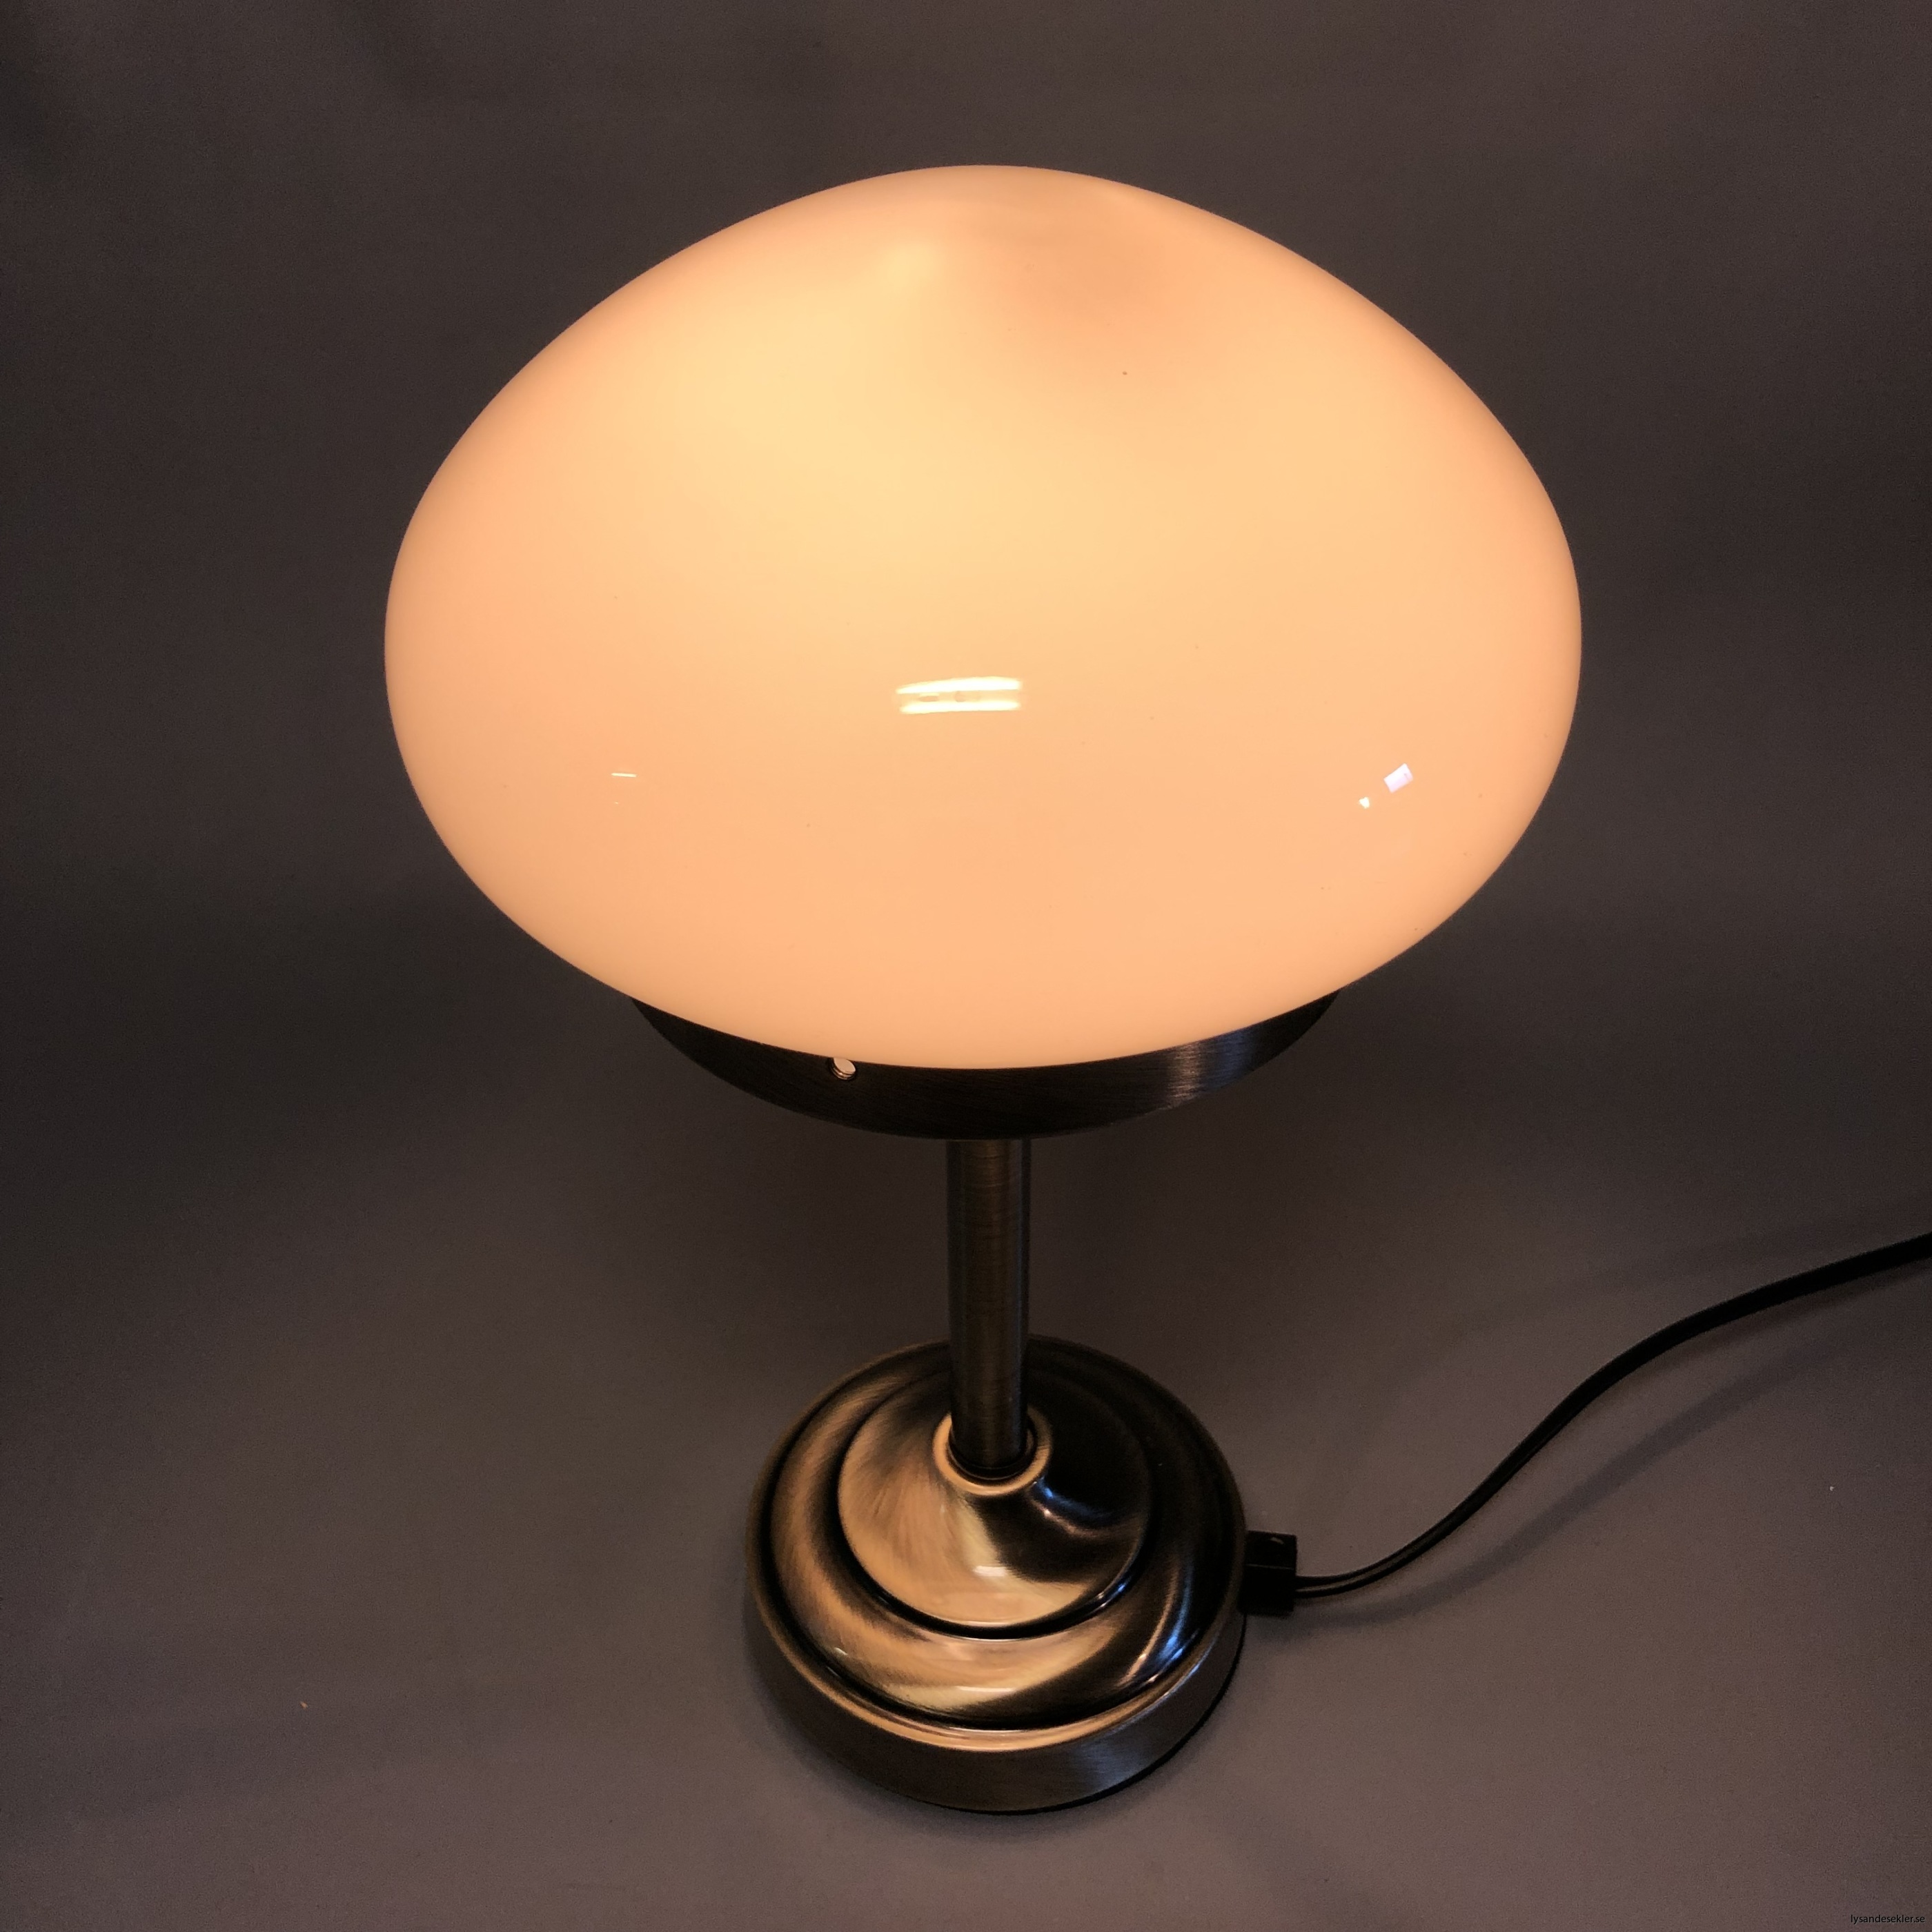 liten strindbergslampa 12 cm skärm4